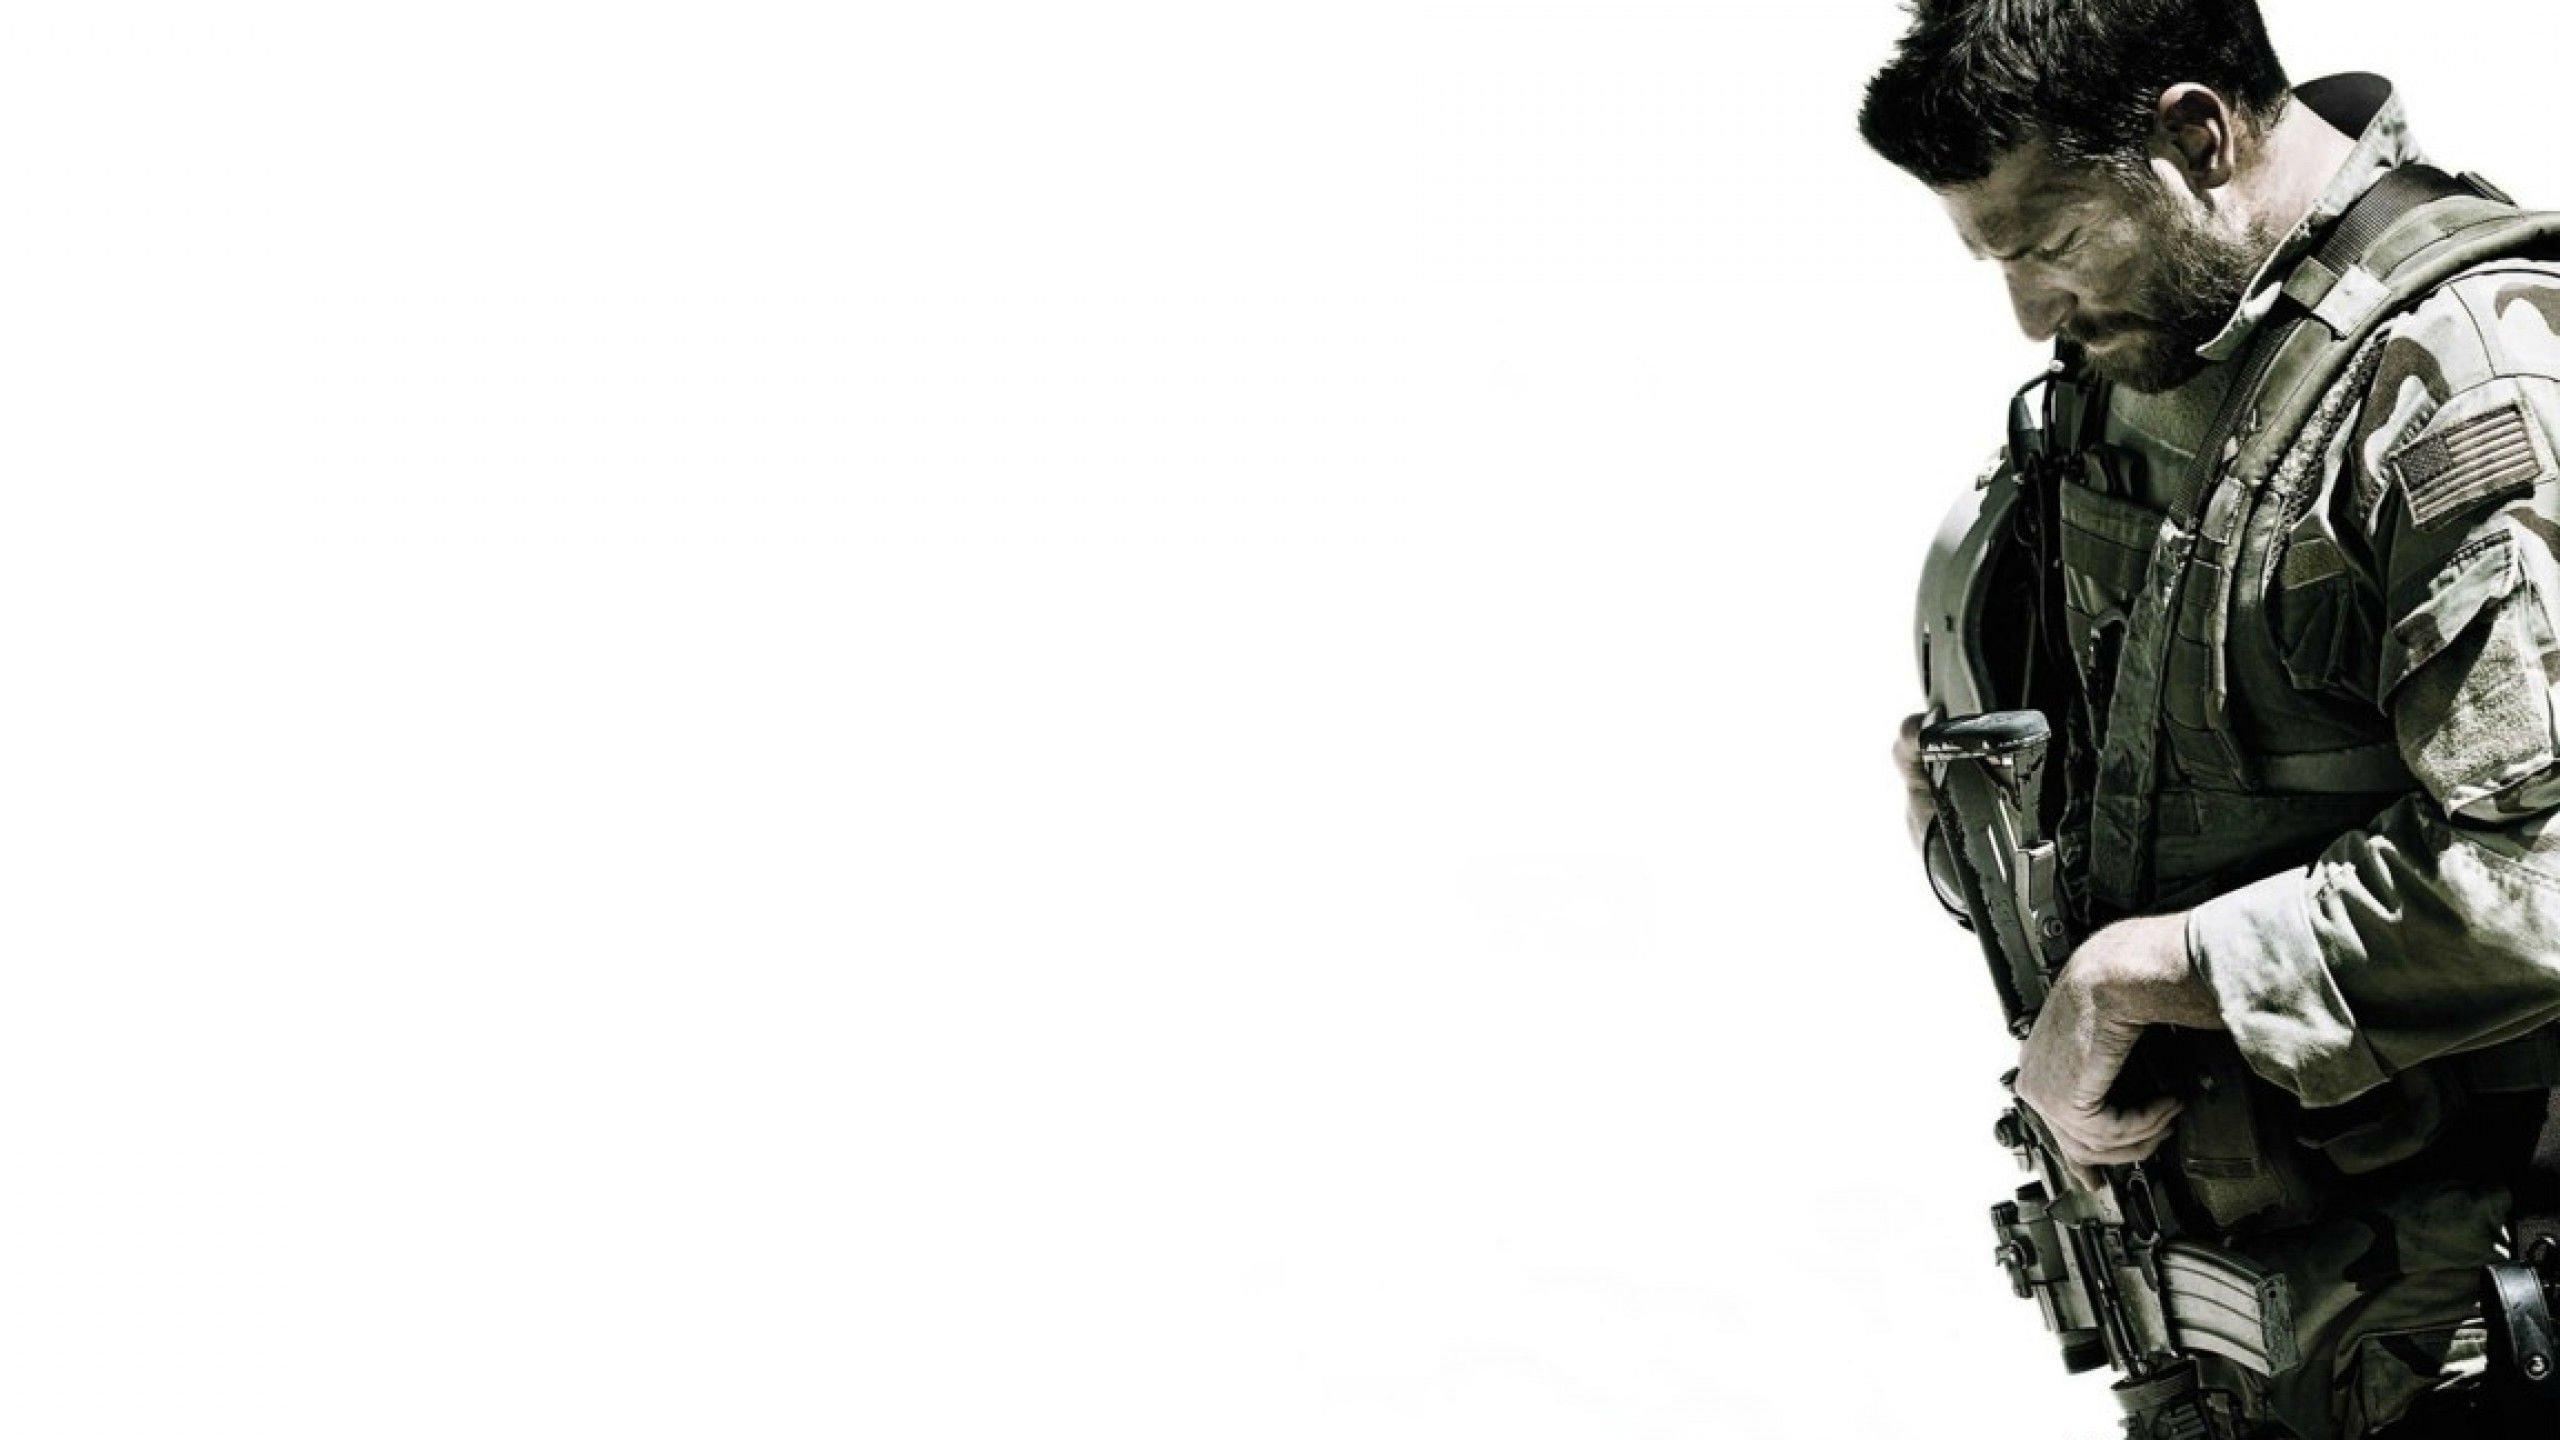 American sniper biography military war fighting navy seal action american sniper biography military war fighting navy seal action clint eastwood 1americansniper weapon gun wallpaper 2560x1440 575058 wallpaperup altavistaventures Choice Image